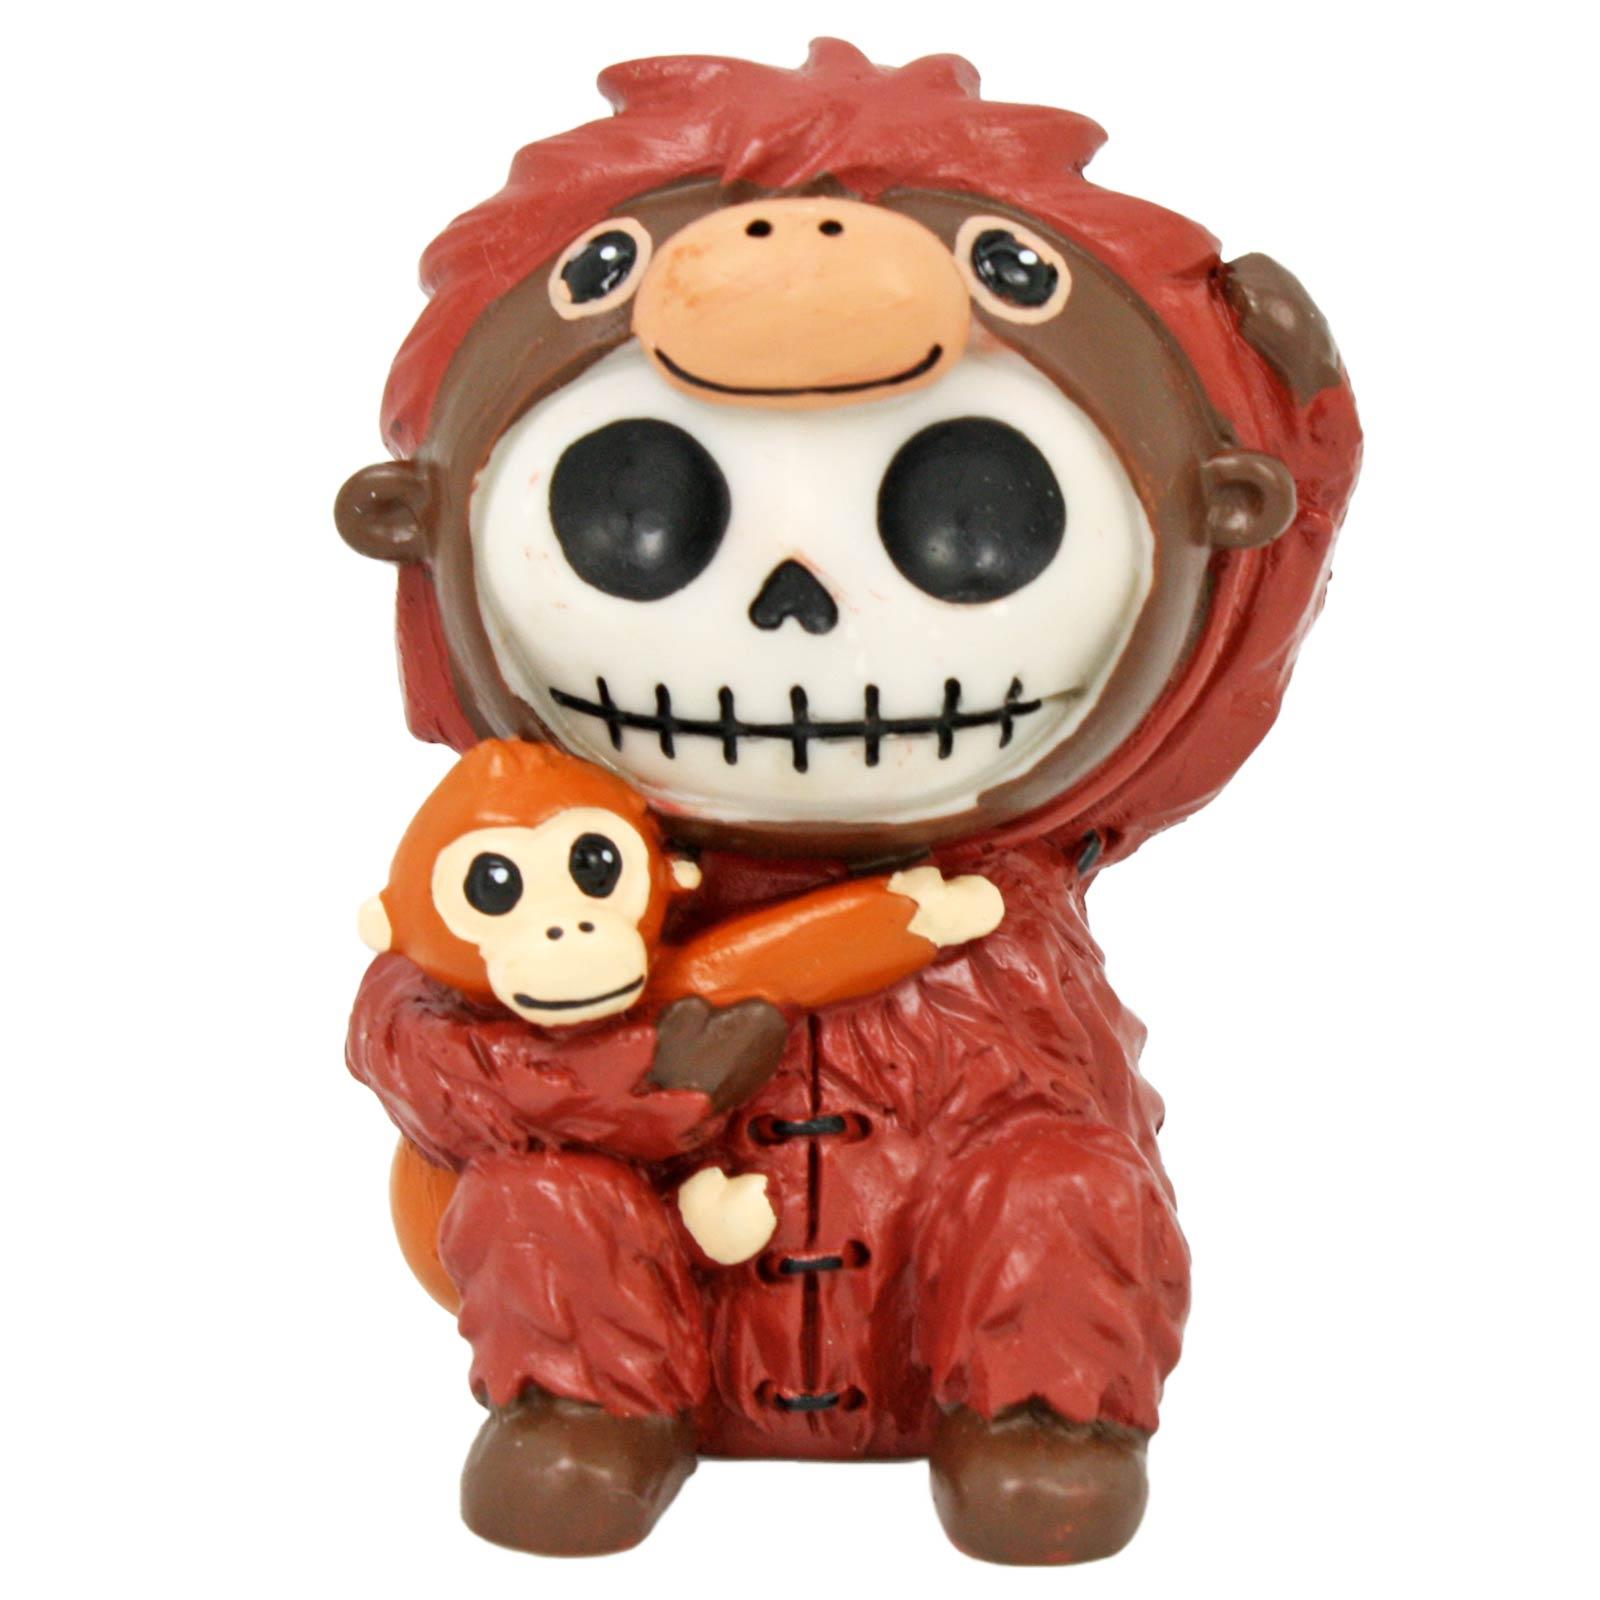 Christmas Decorations Santa Clarita Ca: Resin Furrybones Utan Orangutan Figurine Cute Animal